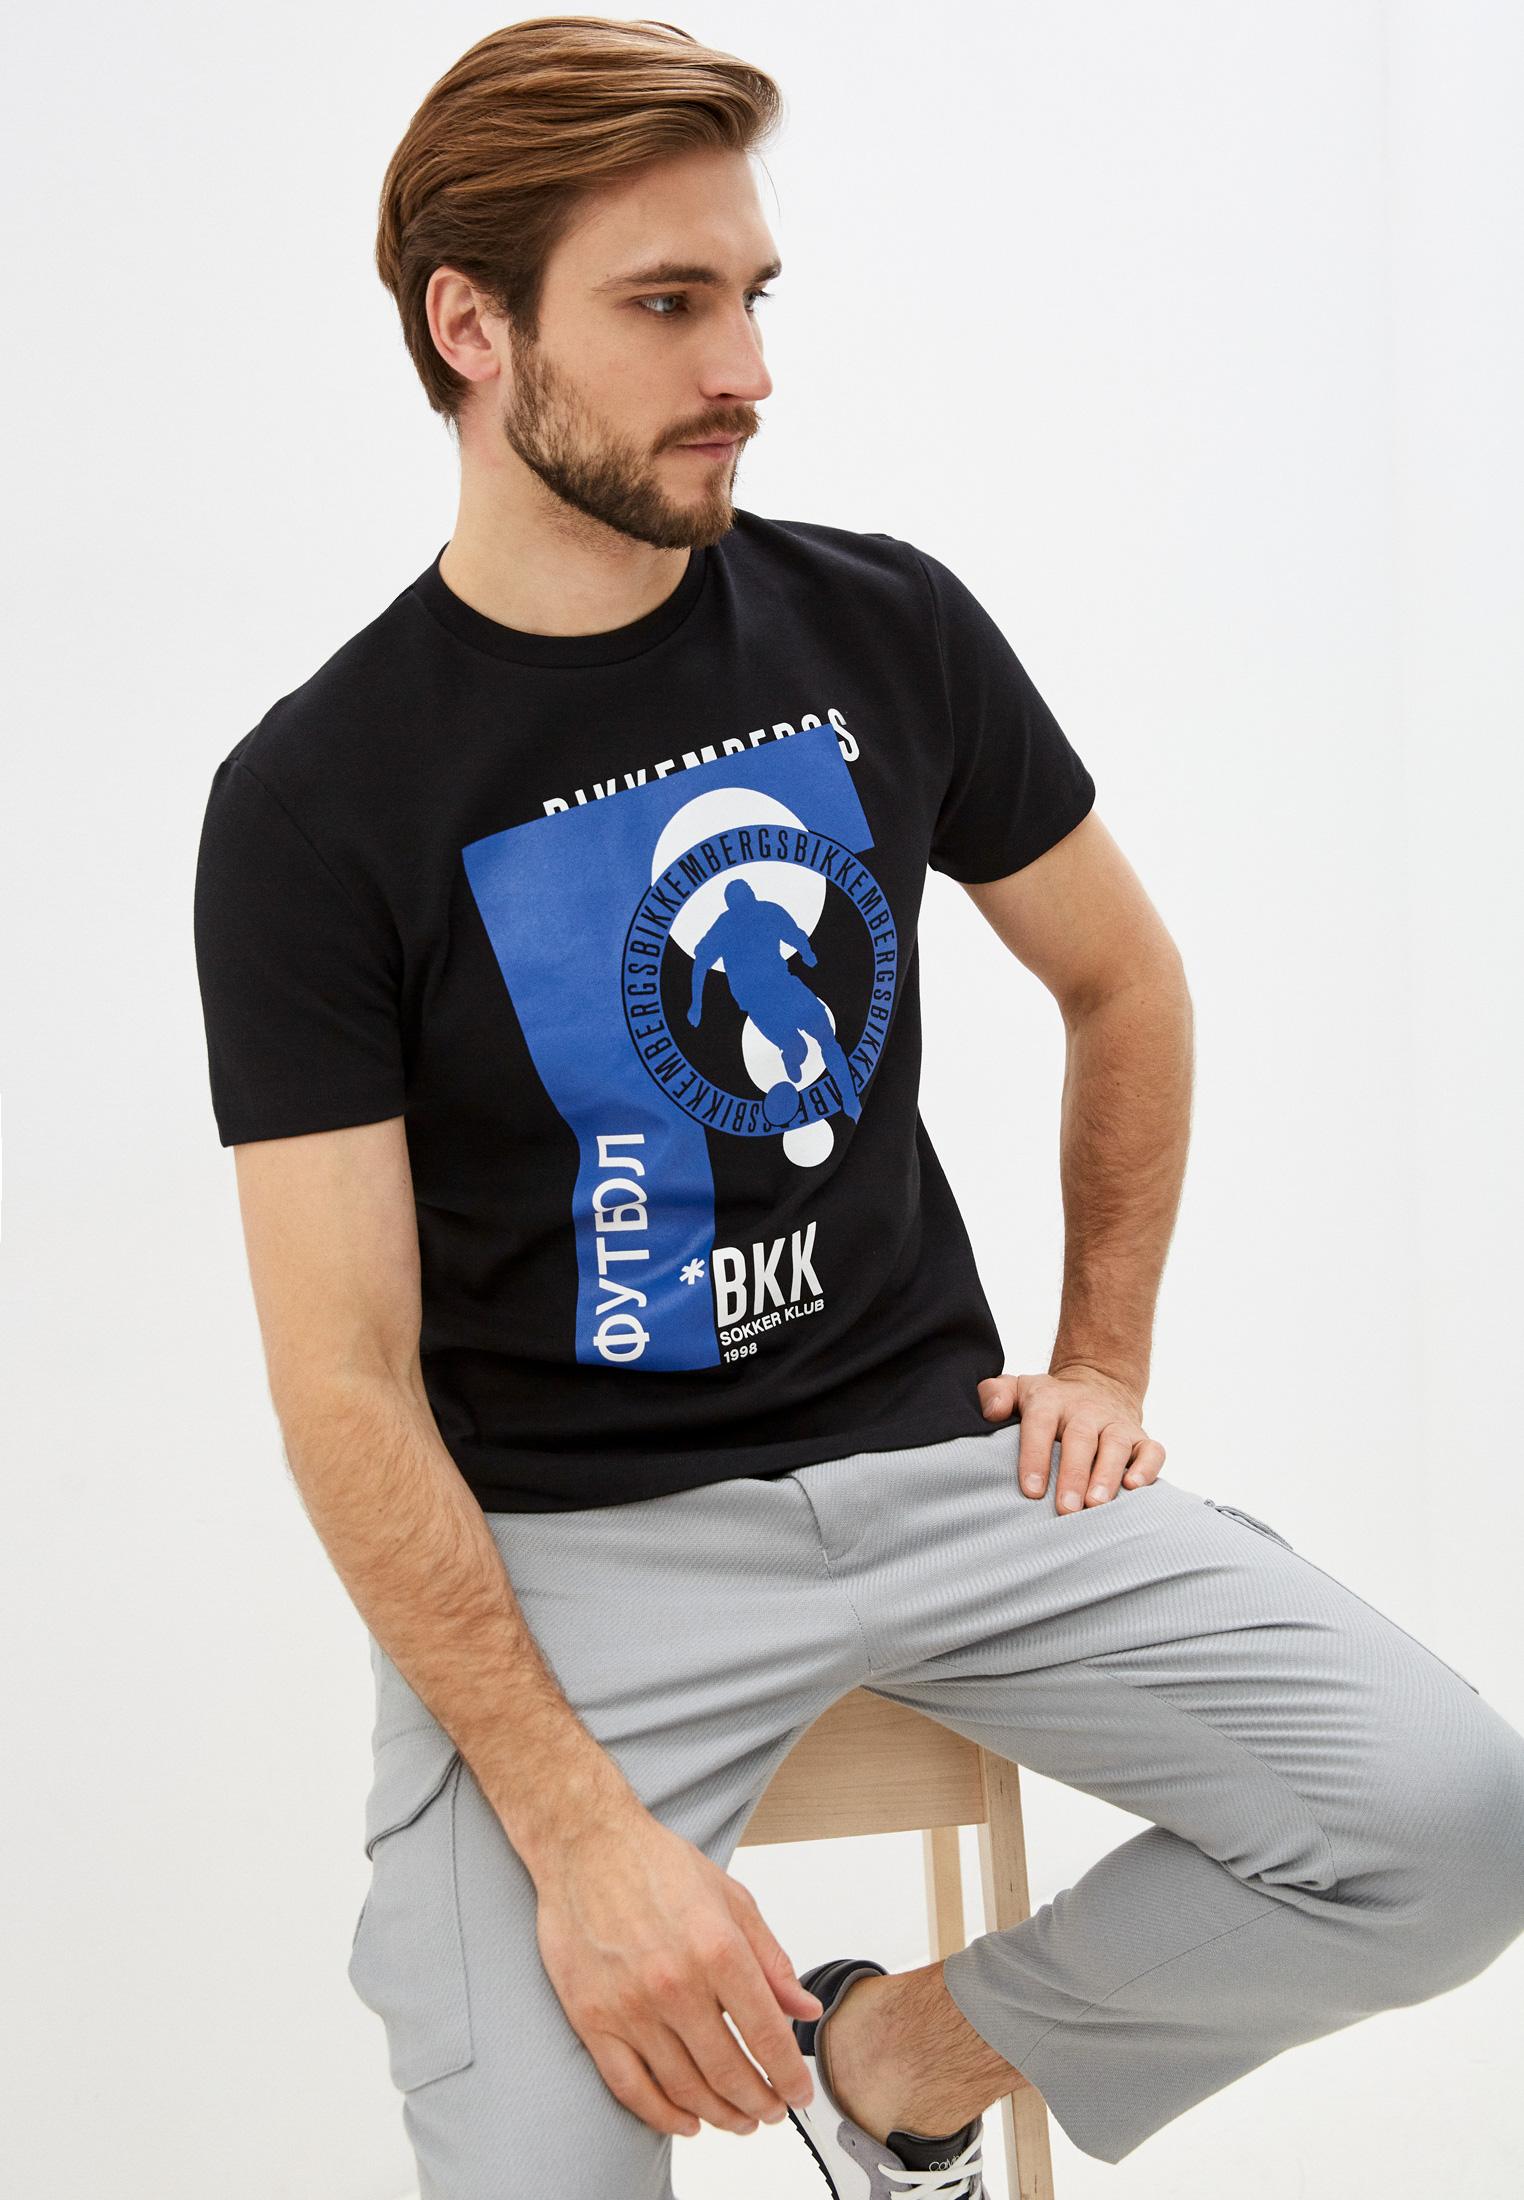 Мужская футболка Bikkembergs (Биккембергс) C 4 101 59 E 2298